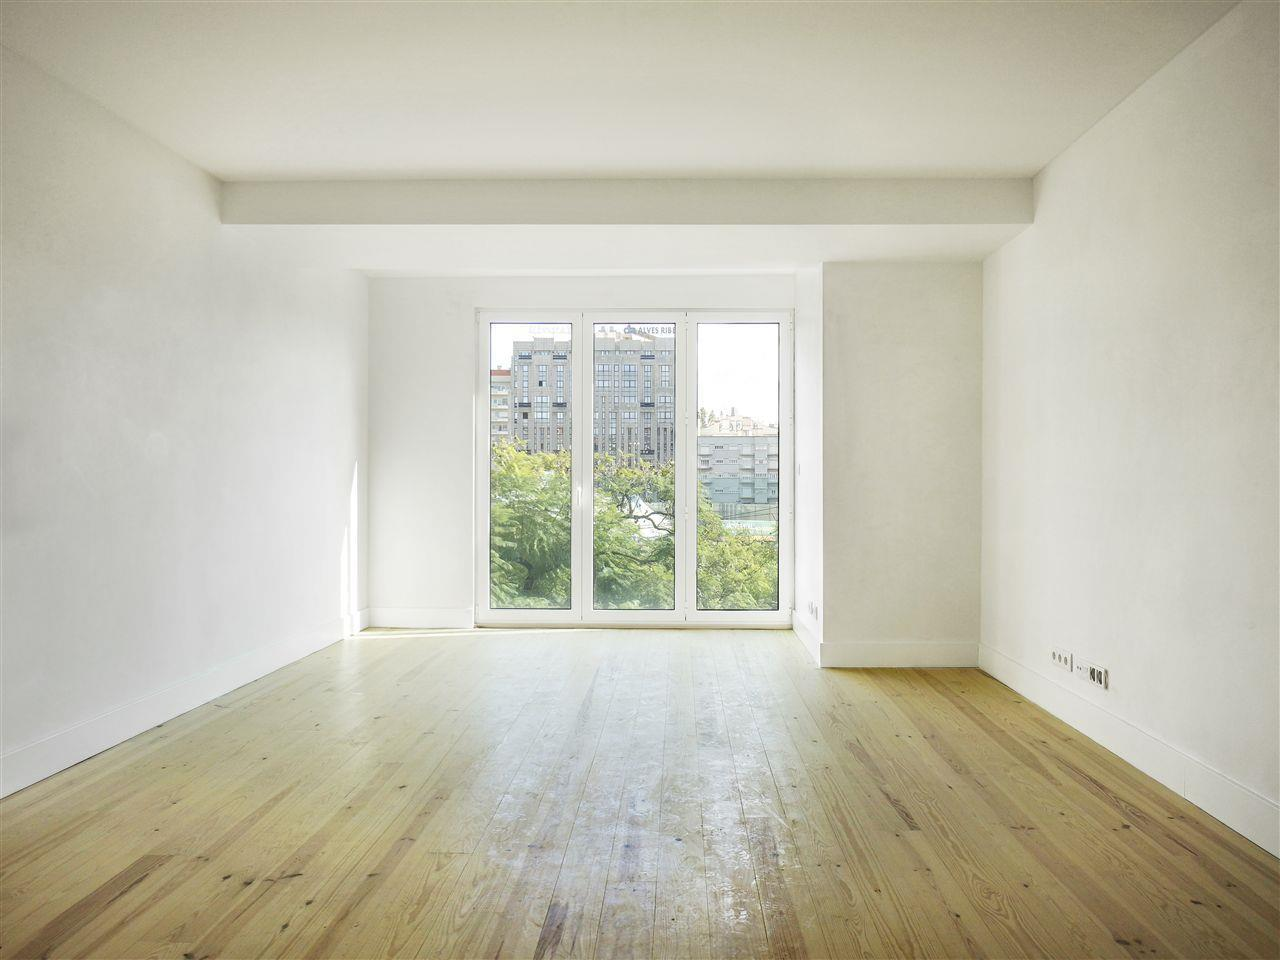 Apartment for Sale at Flat, 4 bedrooms, for Sale Lisboa, Lisboa Portugal